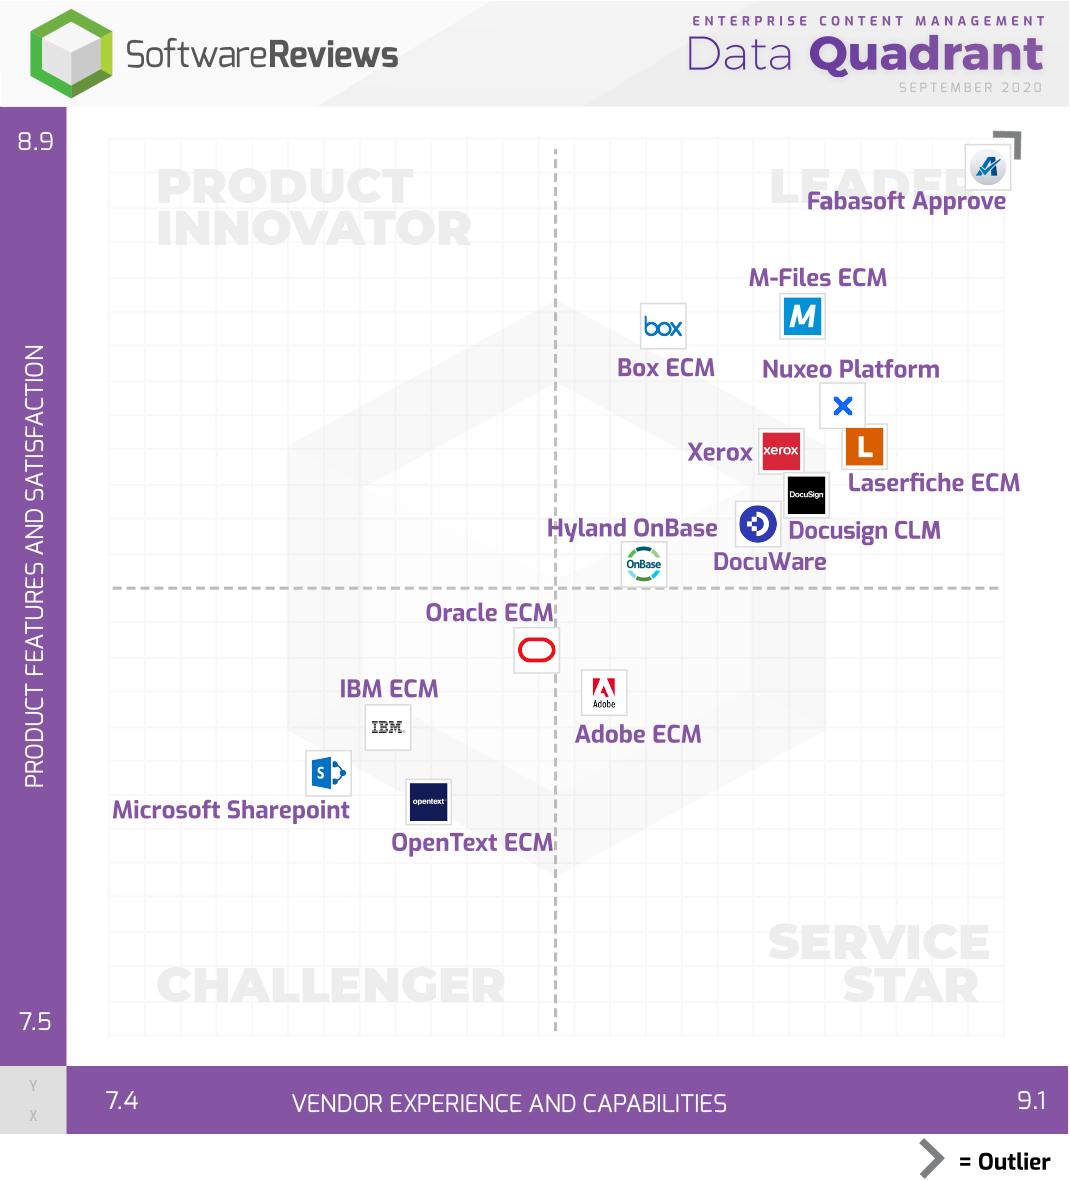 Enterprise Content Management Data Quadrant